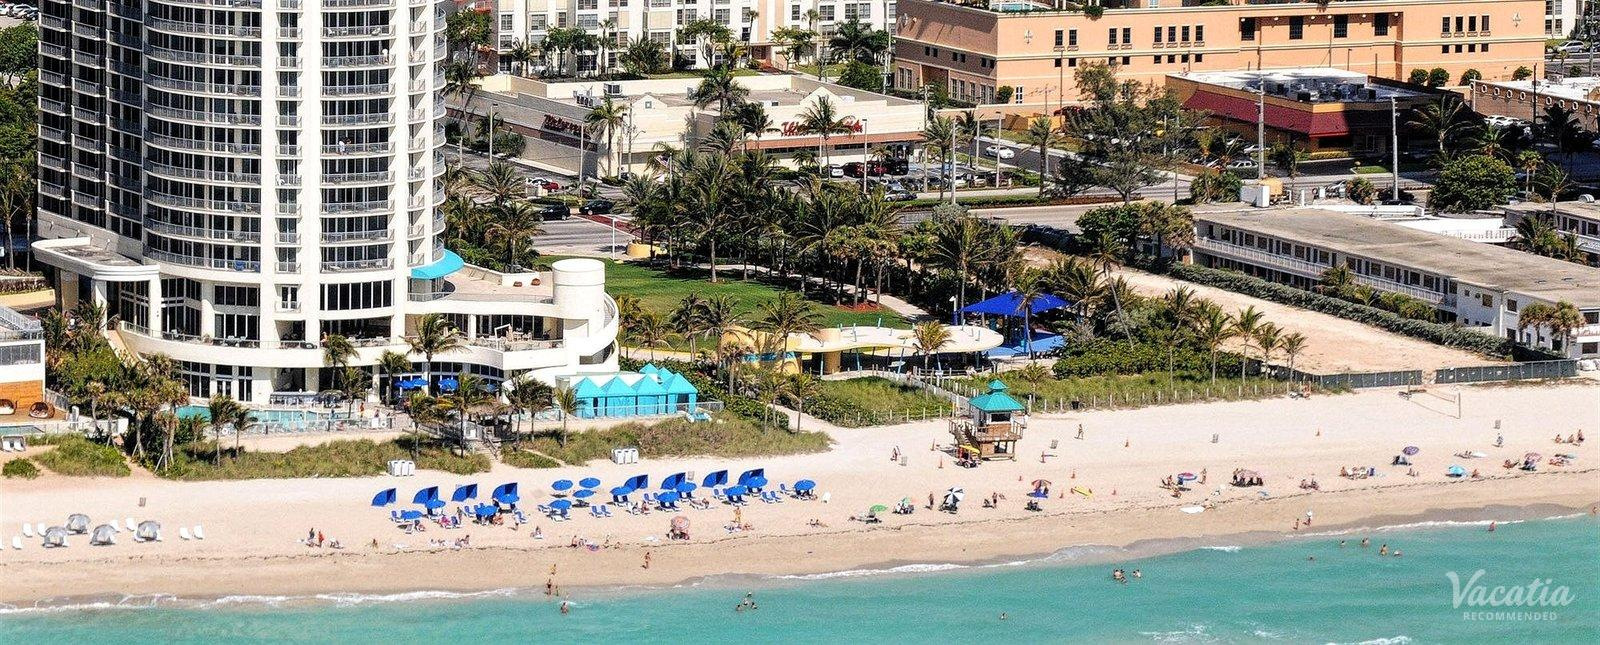 Doubletree Resort Miami South Beach